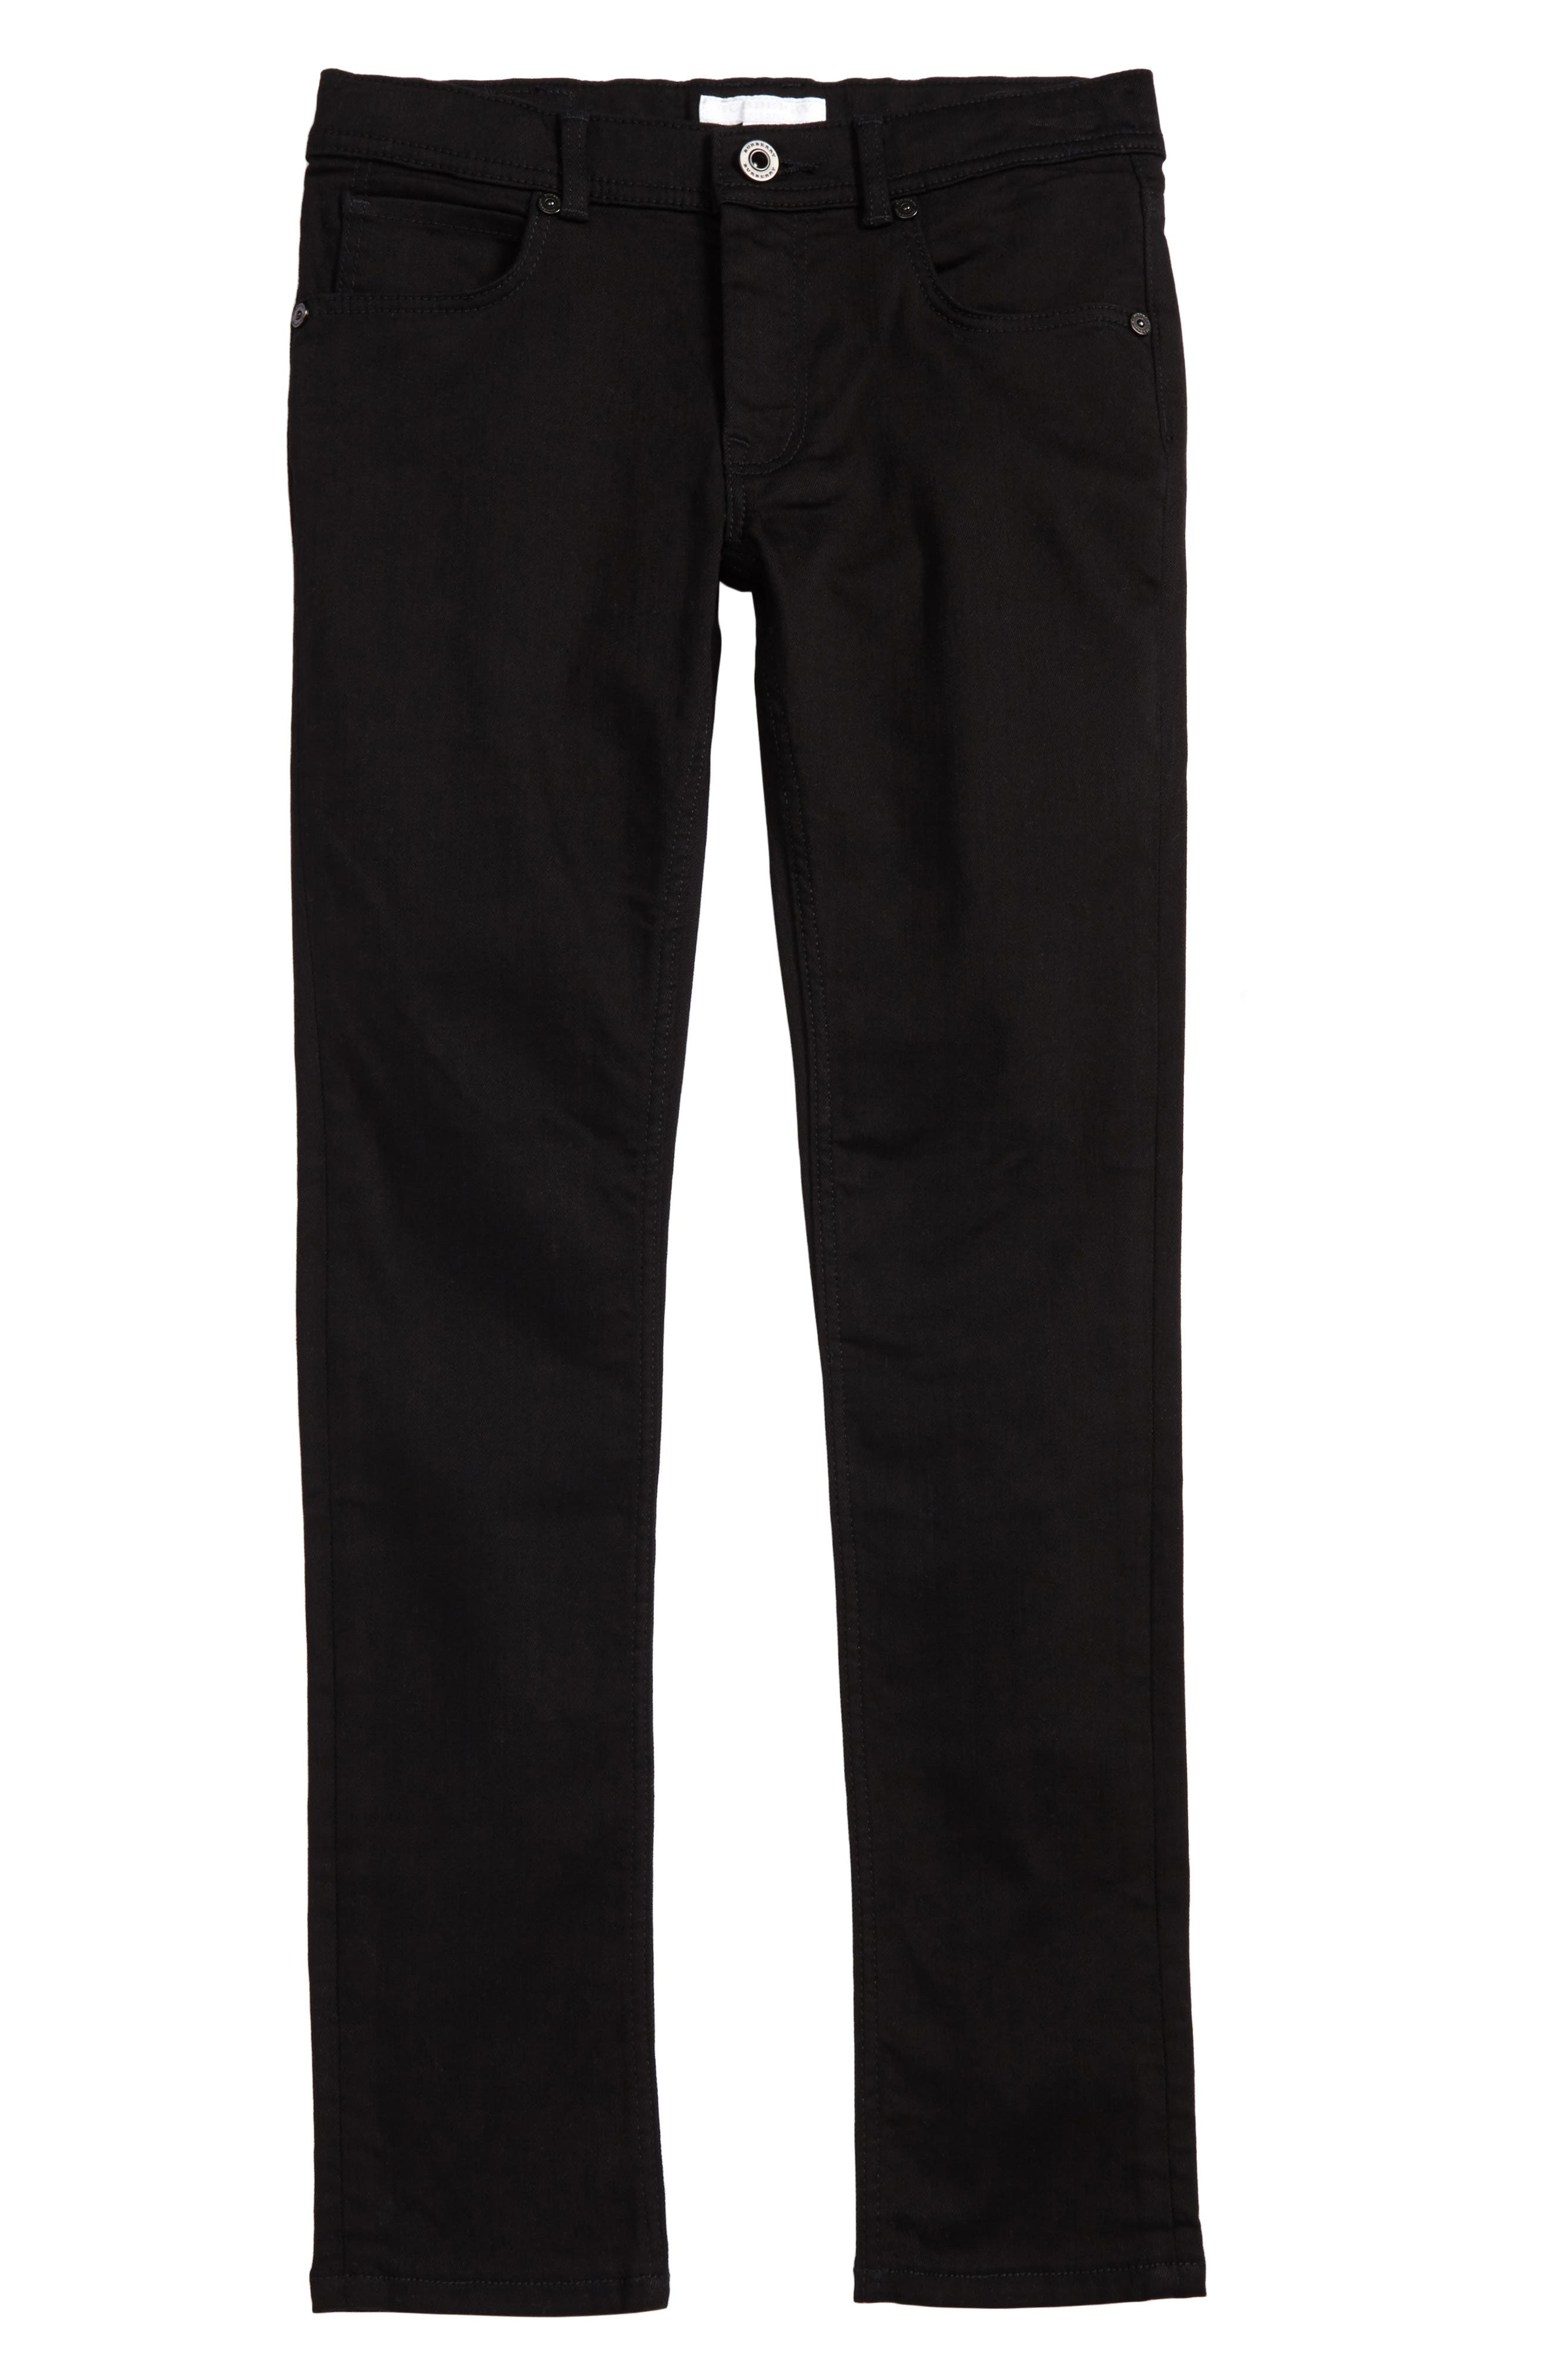 BURBERRY, Skinny Jeans, Main thumbnail 1, color, BLACK